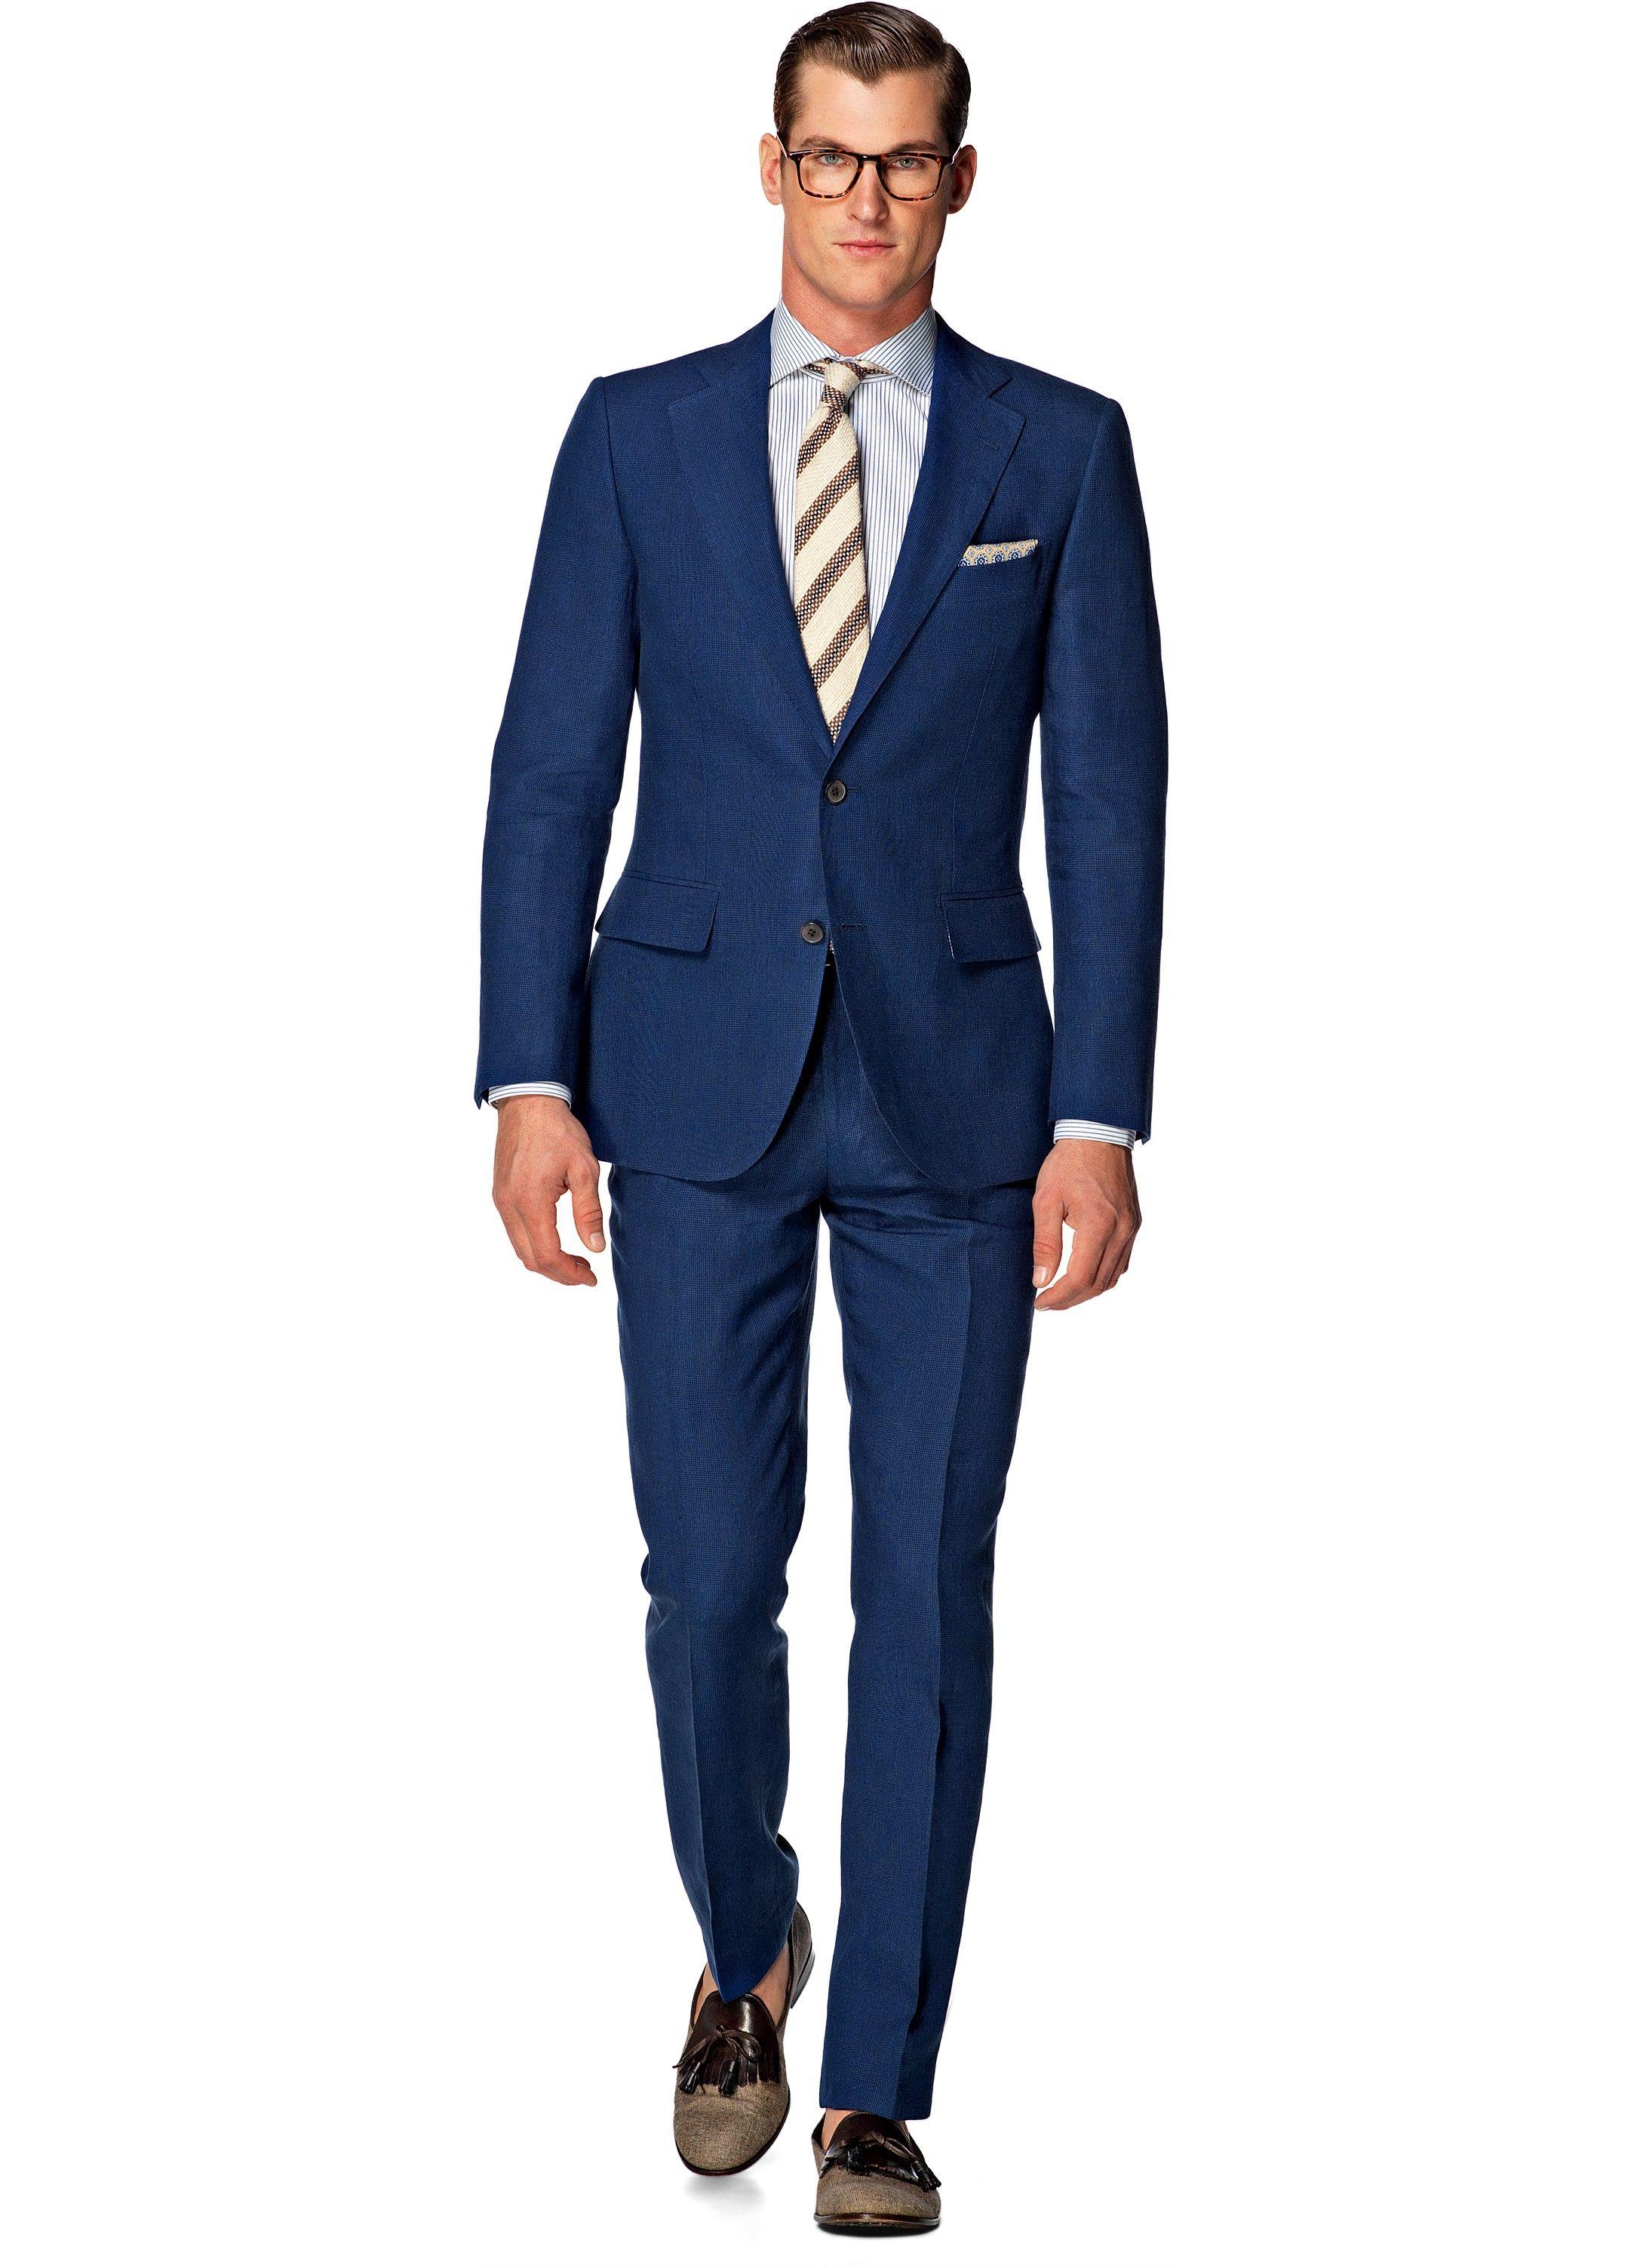 7a3aec2e0729 Suit Blue Check Lazio P4232i | Suitsupply Online Store | Style ...